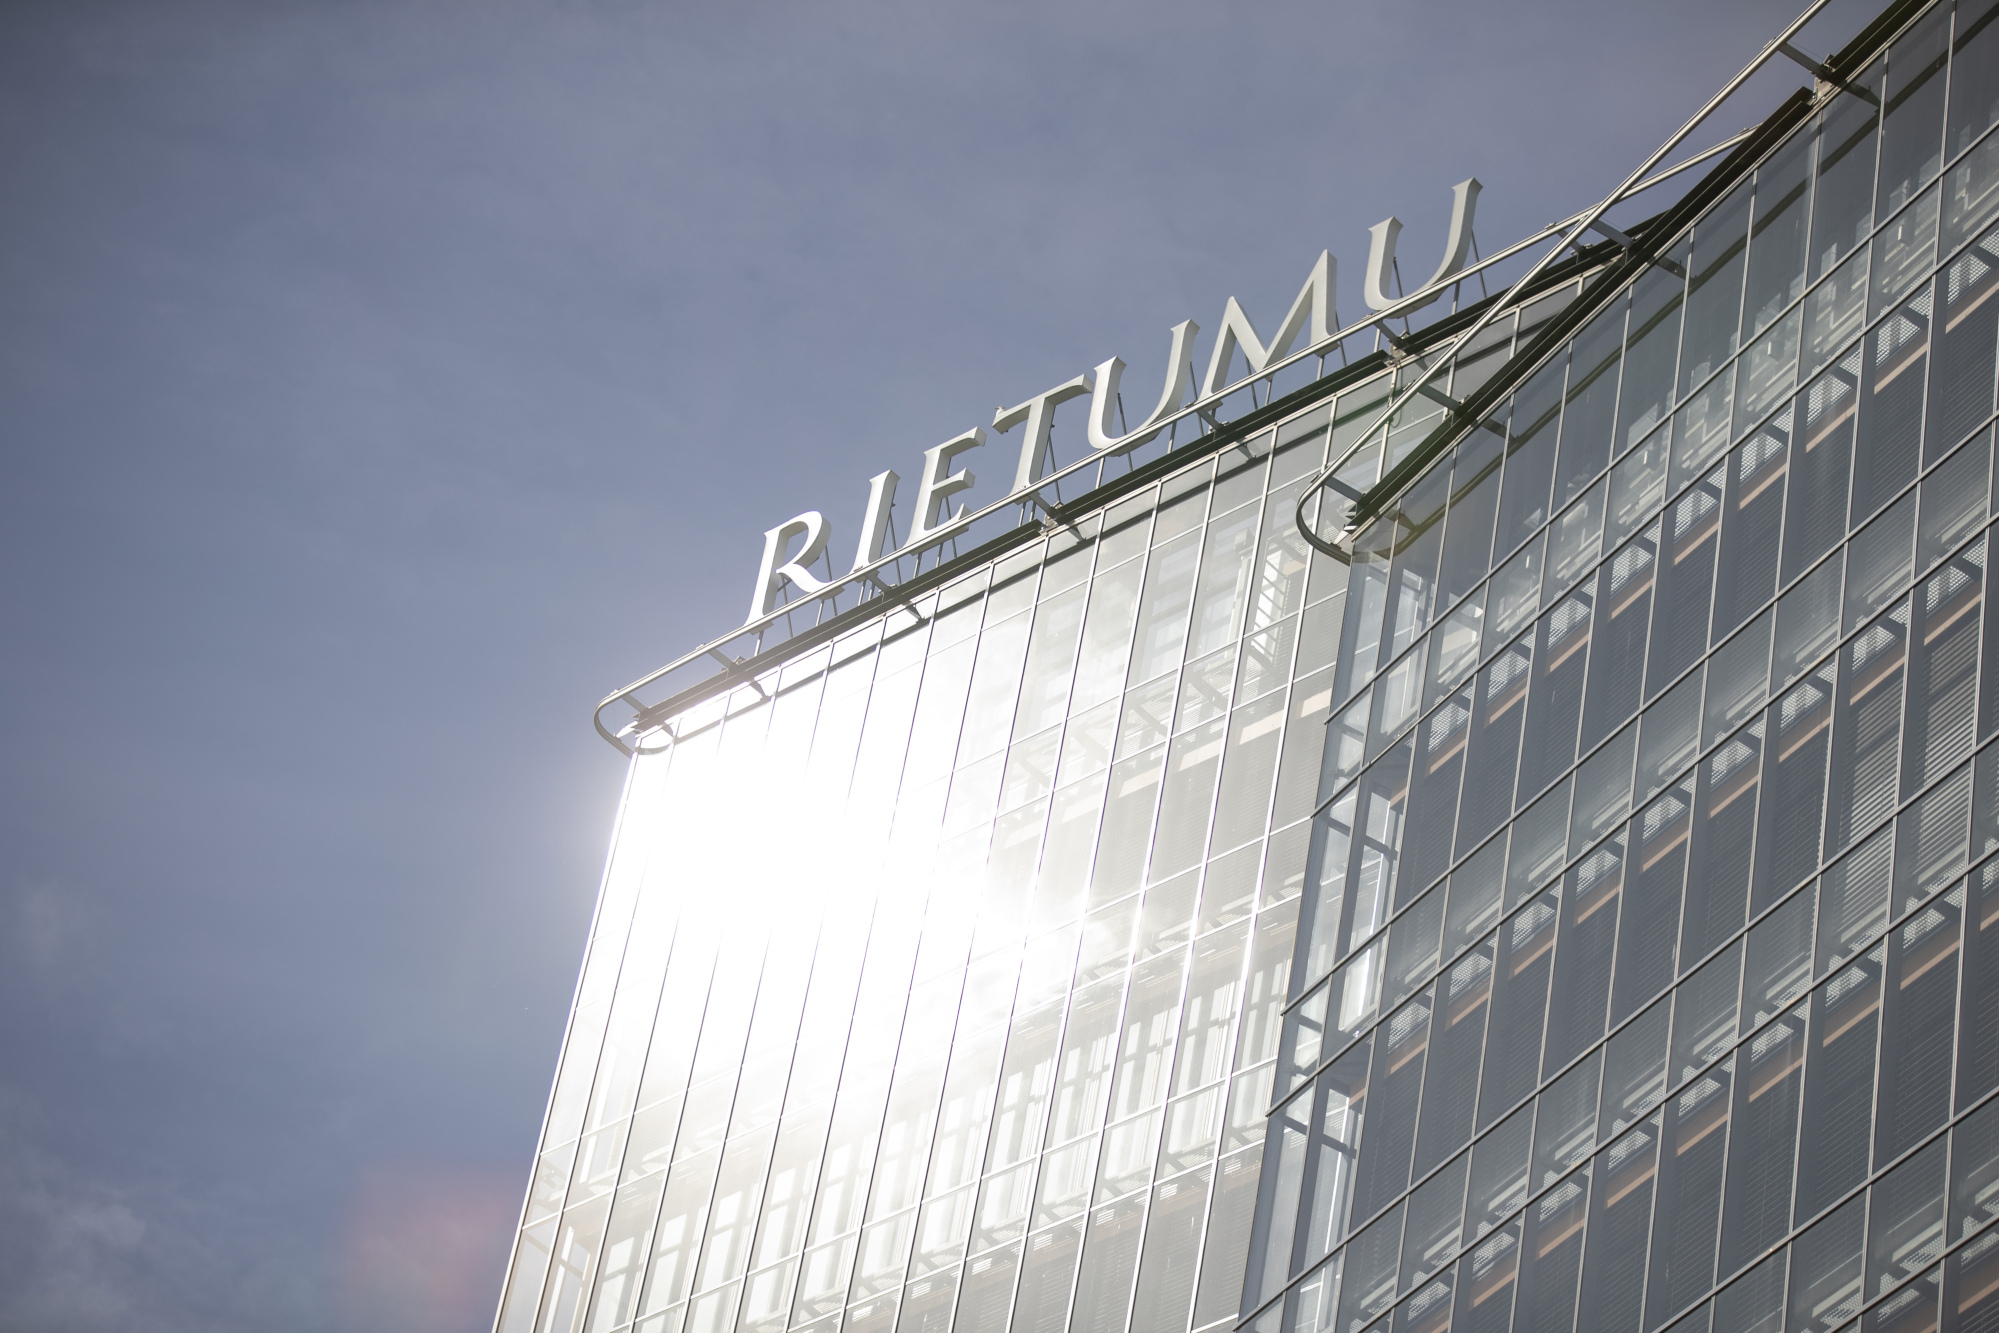 Rietumu Banka headquarters in Riga, Latvia.